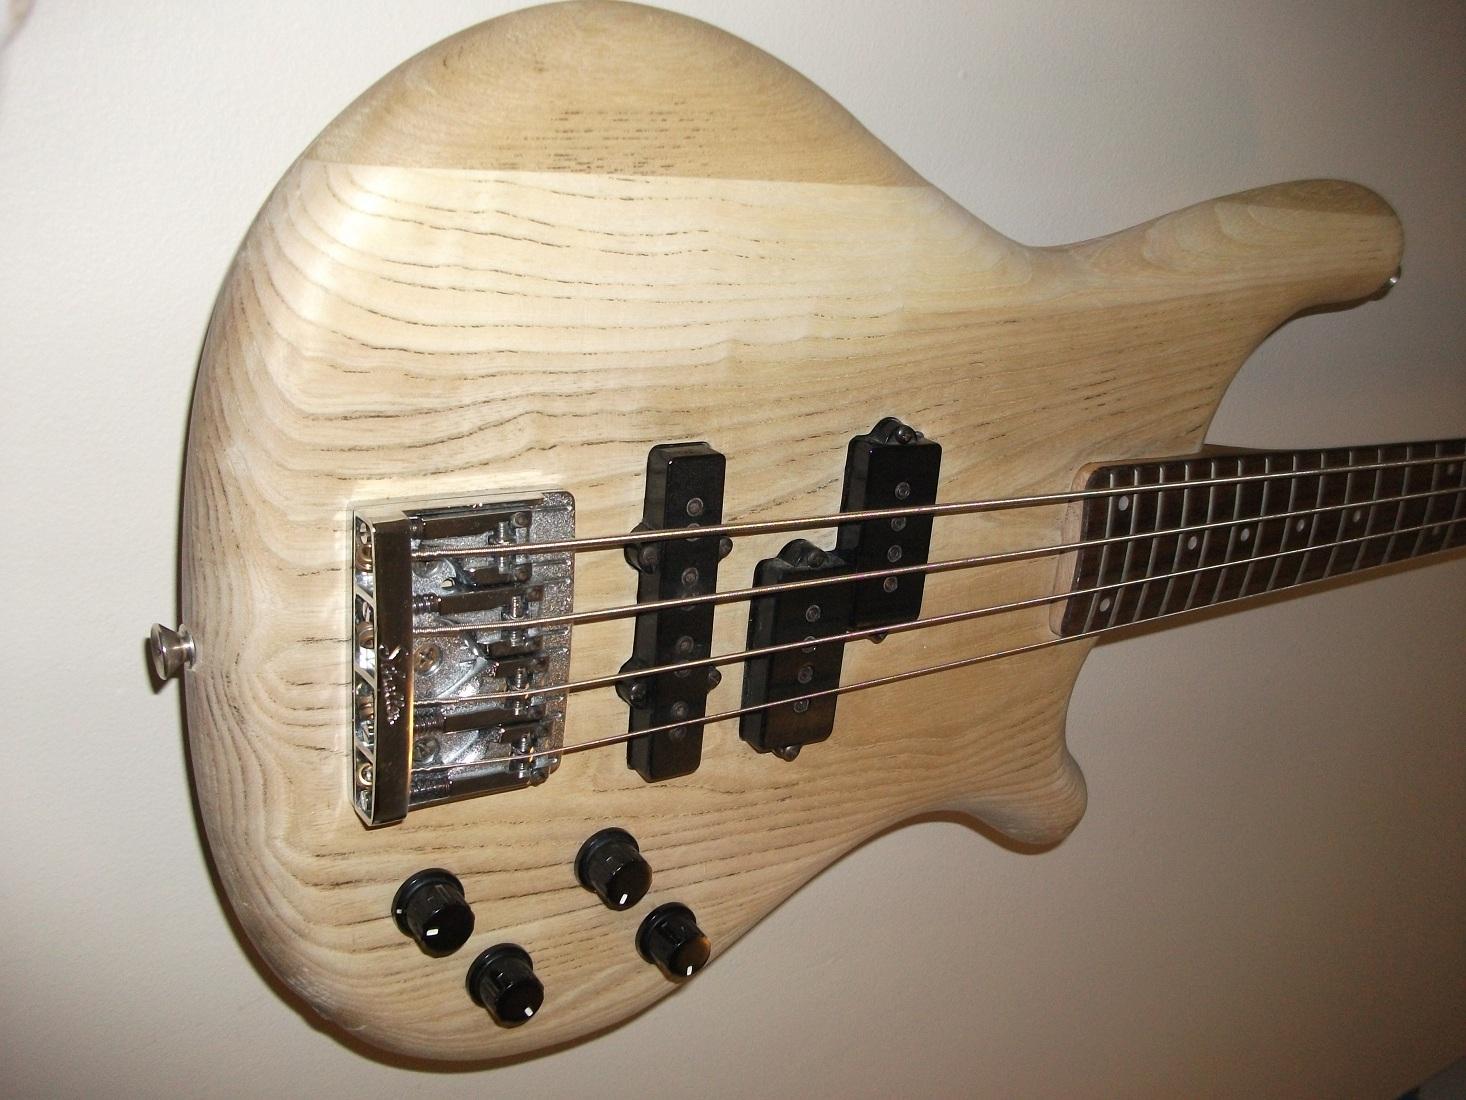 marcel van oort 39 s guitars and equipment 1986 kawai bass. Black Bedroom Furniture Sets. Home Design Ideas